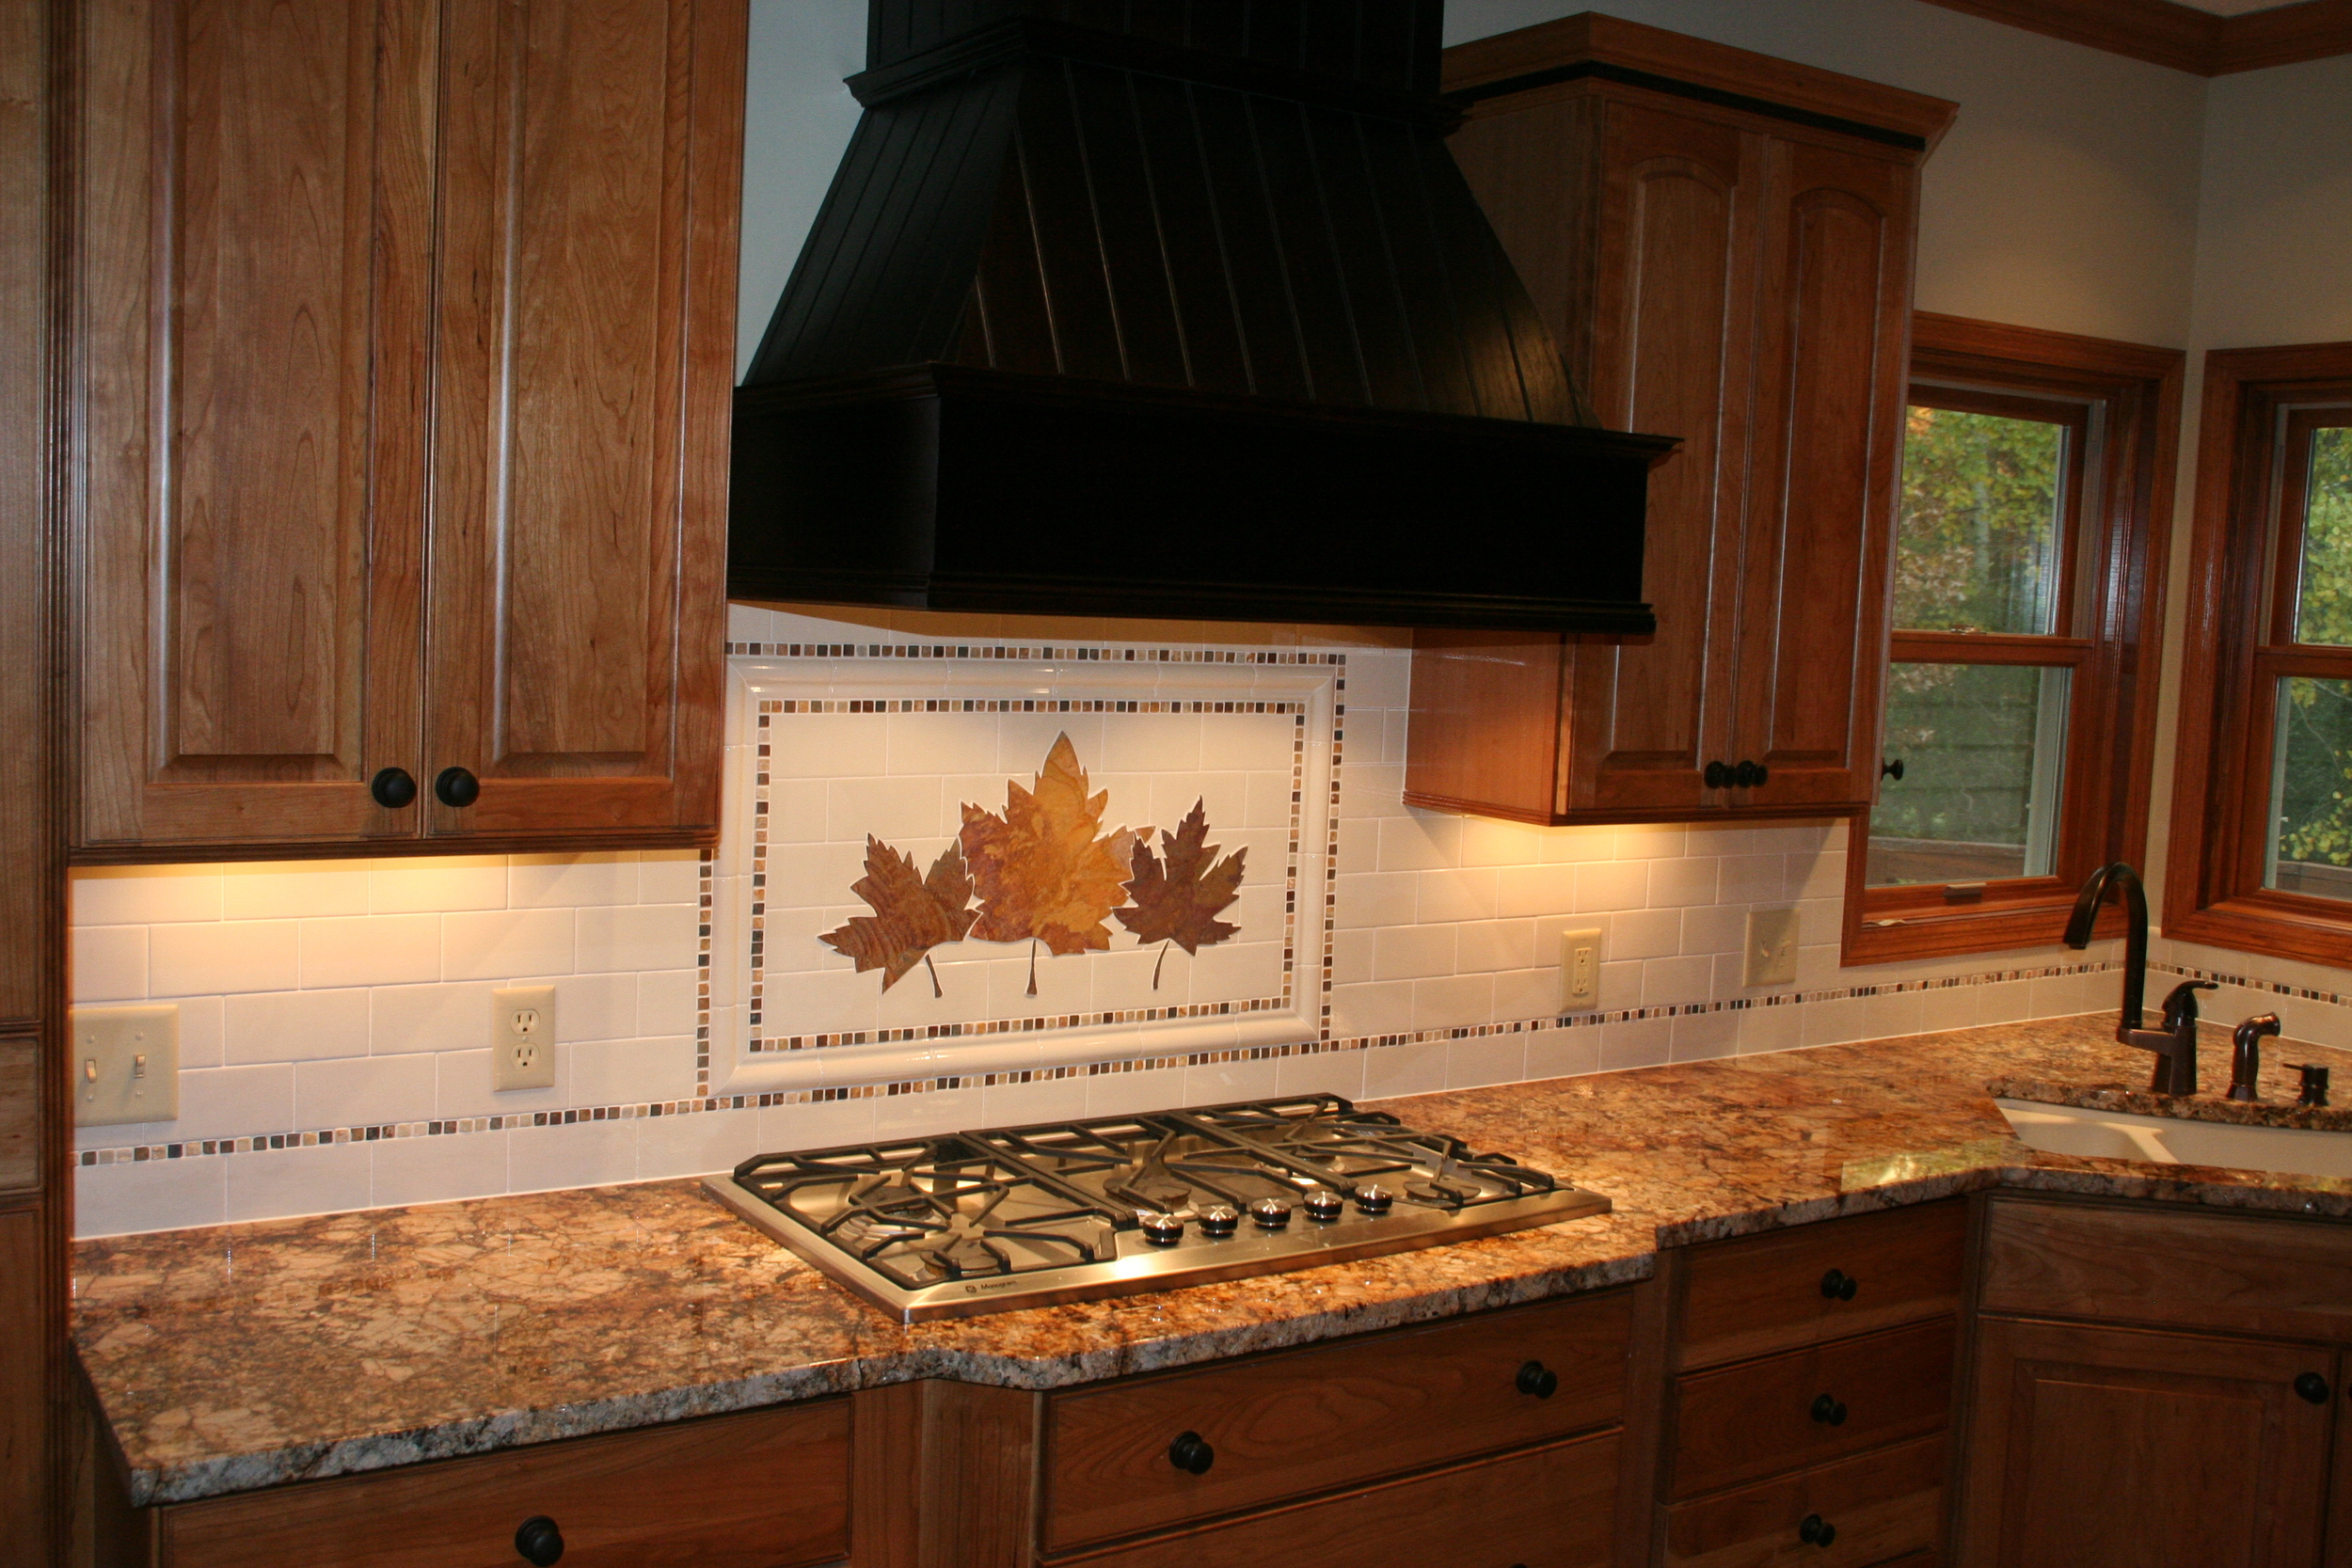 Maple Leaf Backsplash